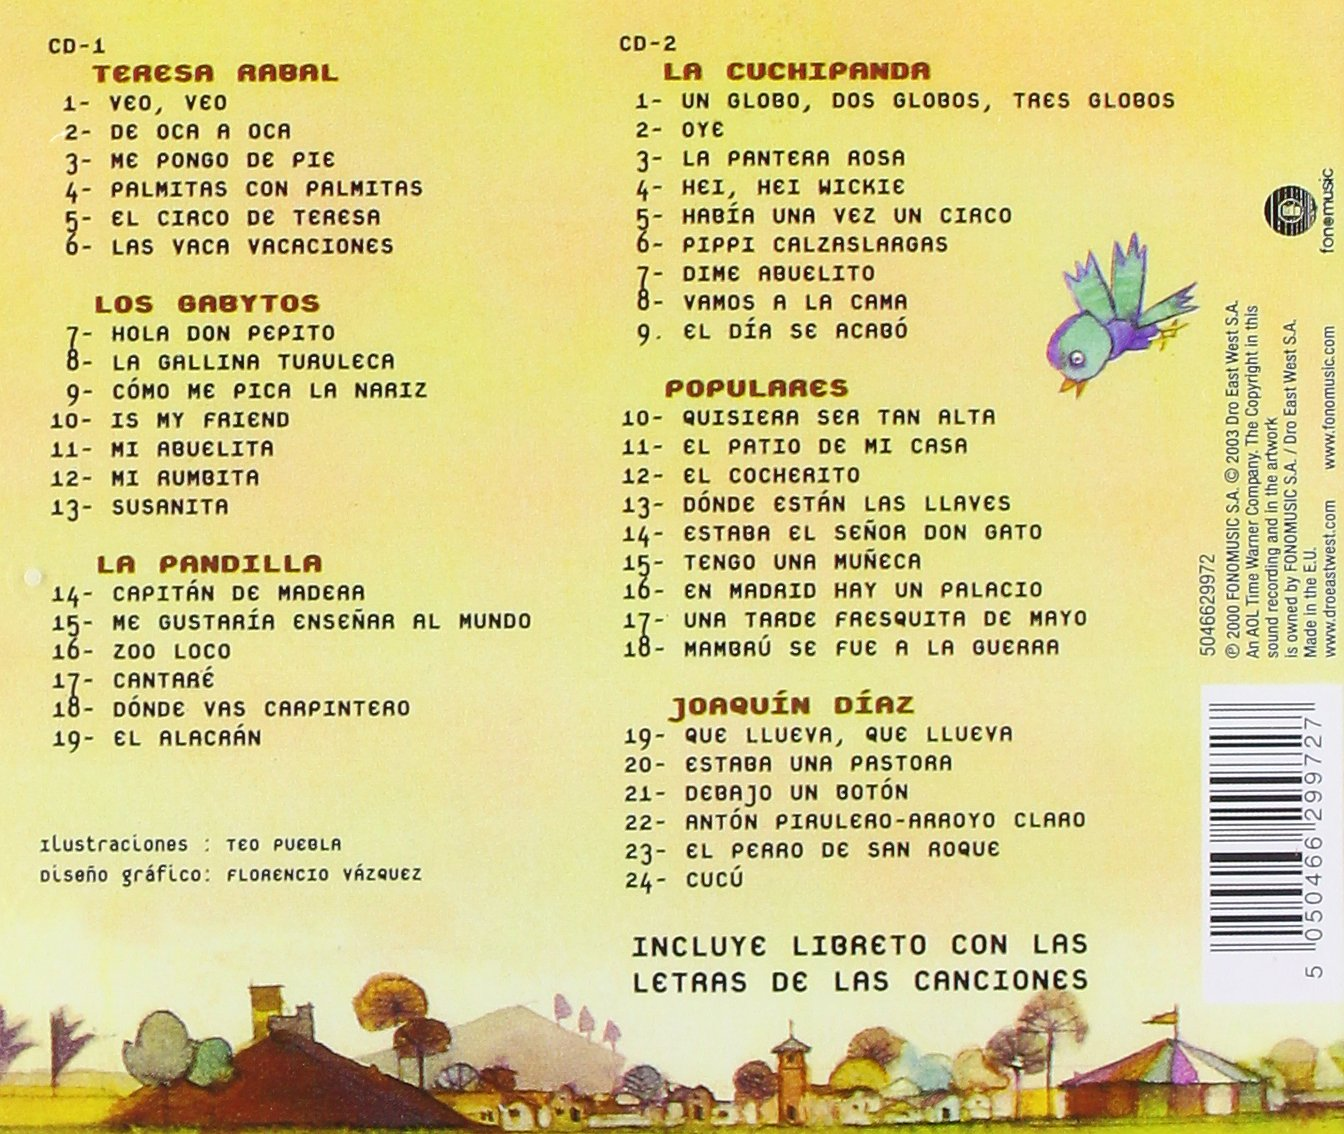 Solo Para Ninos Y Mayores - Solo Para Ninos y Mayores / Various - Amazon.com Music